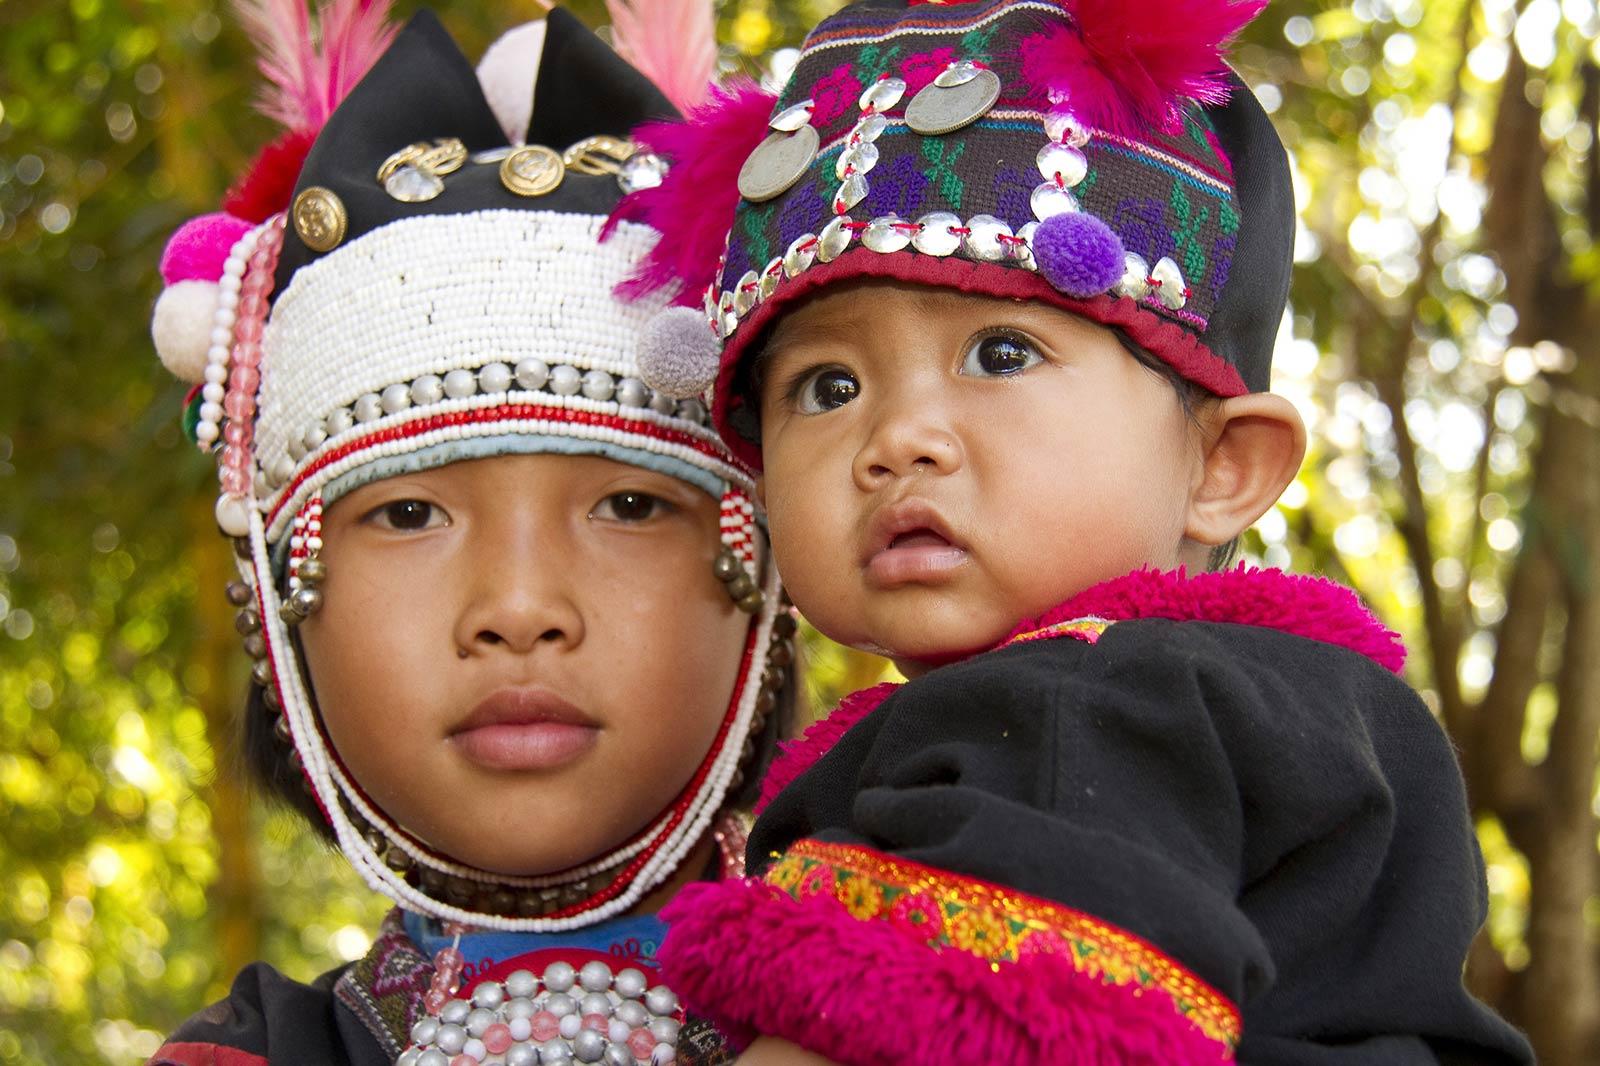 Bambini in Thailandia